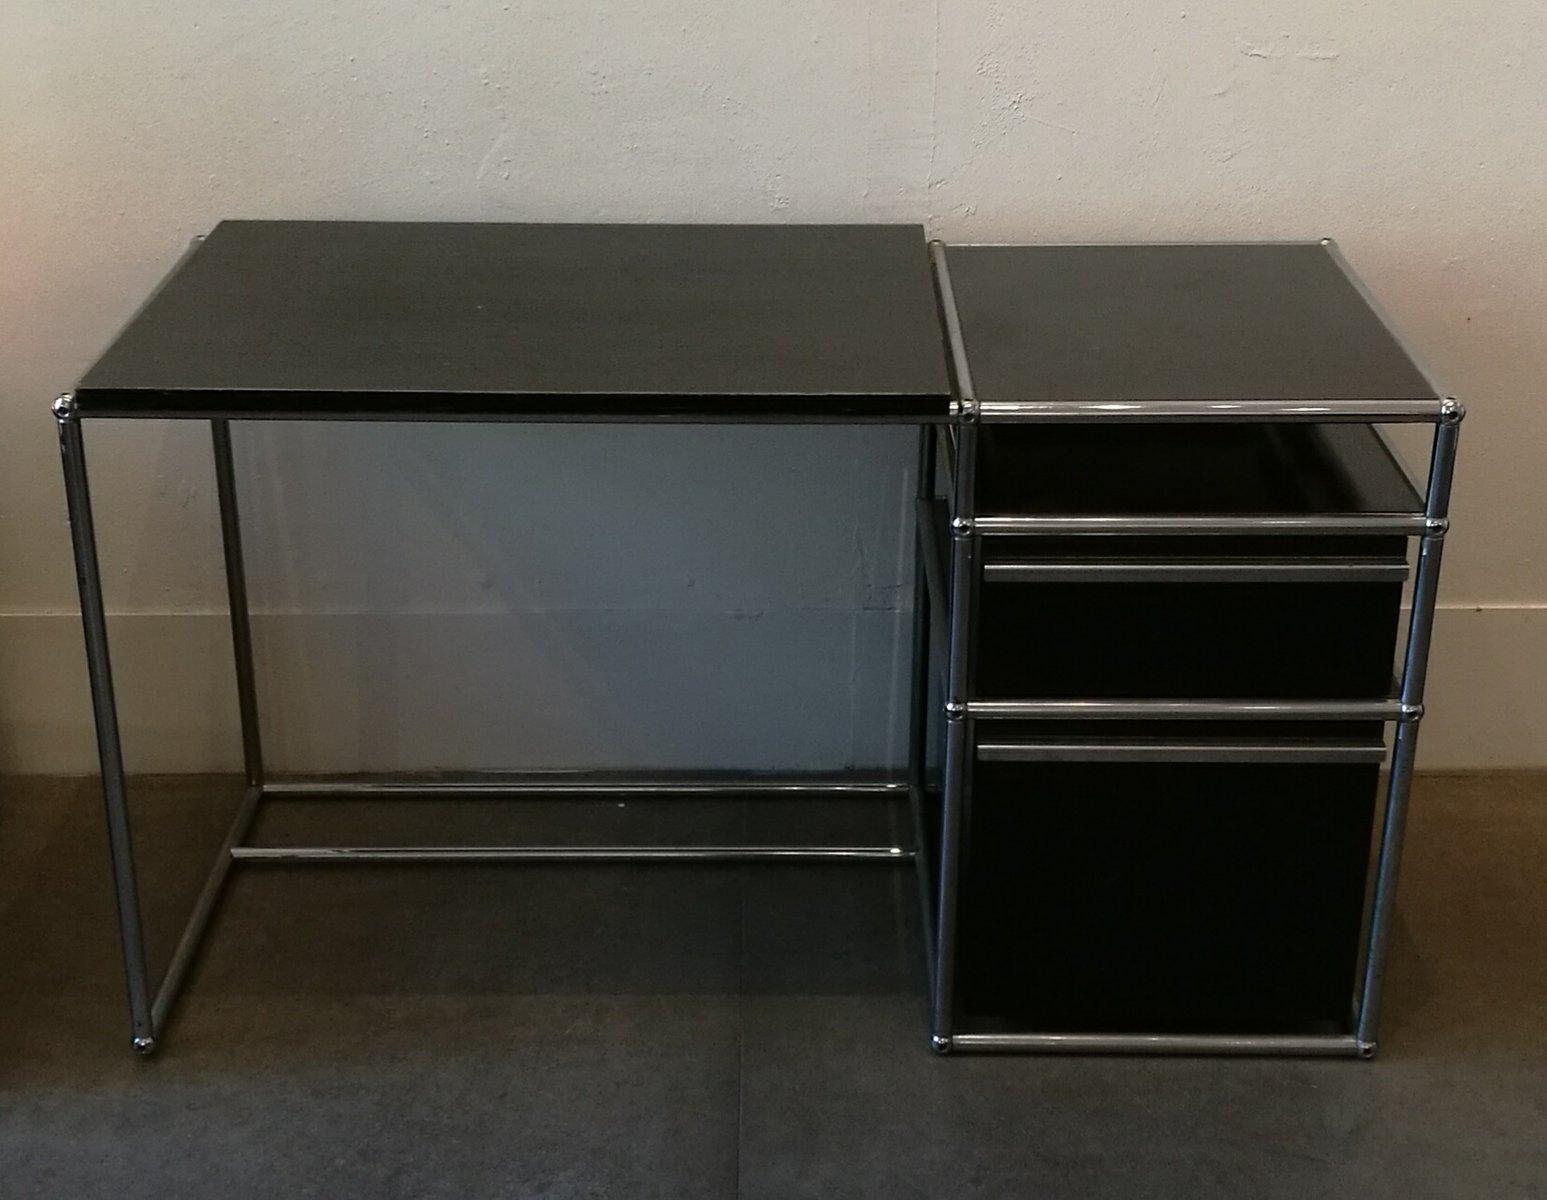 Bureau en métal noir de usm haller 1980s en vente sur pamono